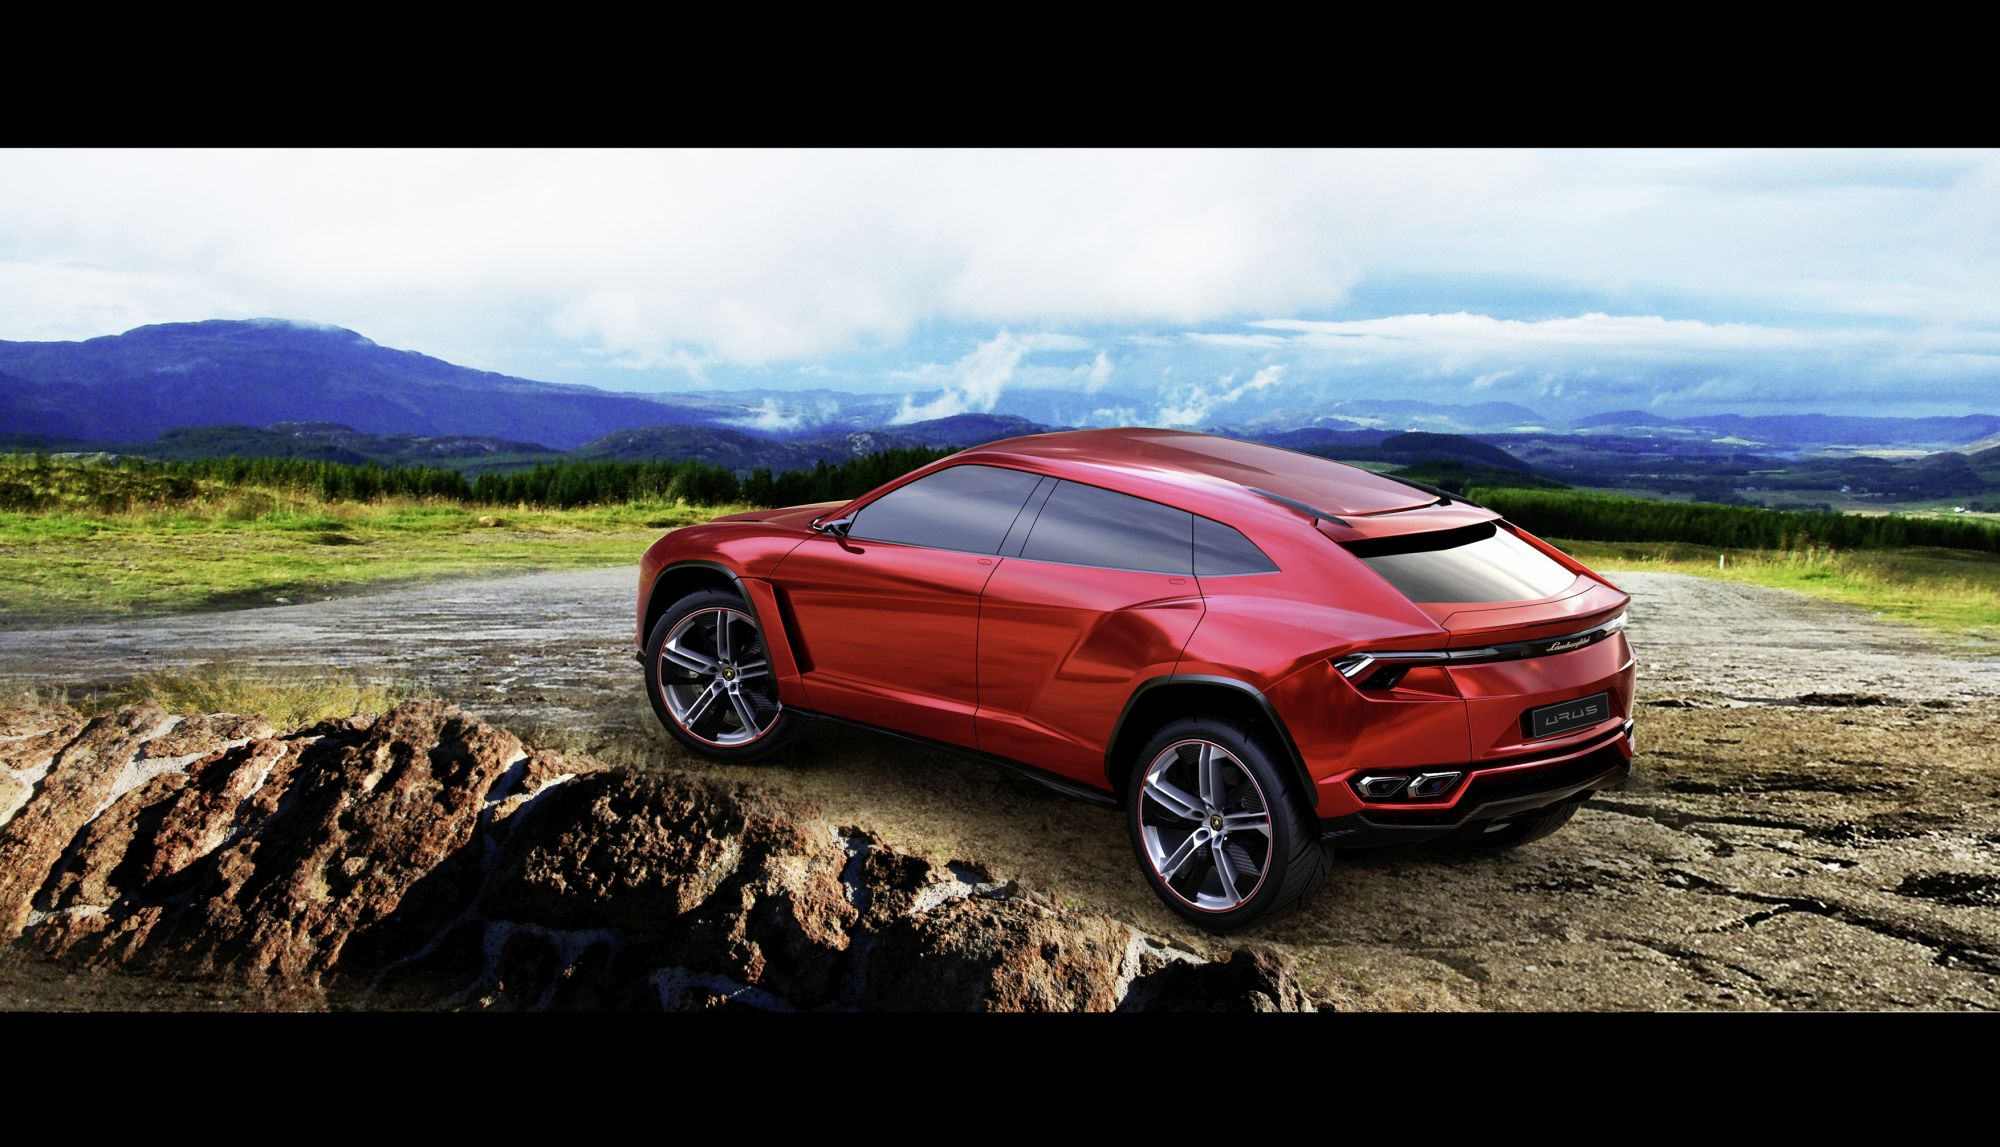 Lamborghini launches luxury SUV